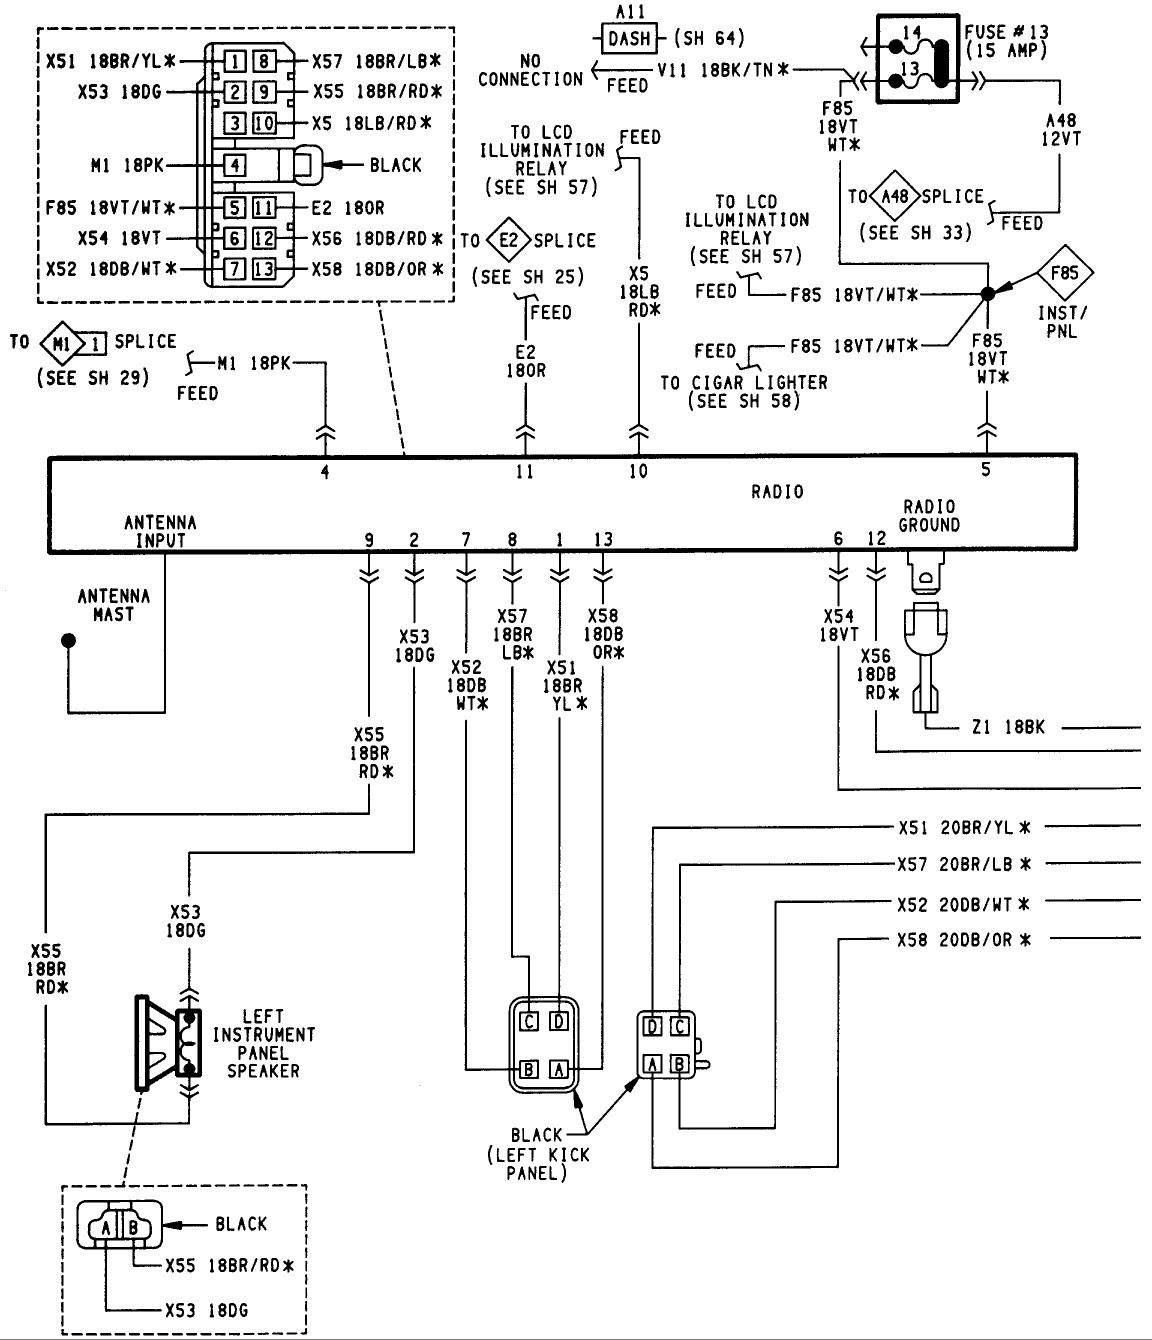 wiring diagram 2002 jeep liberty - wiring diagram silk-silverado -  silk-silverado.disnar.it  disnar.it